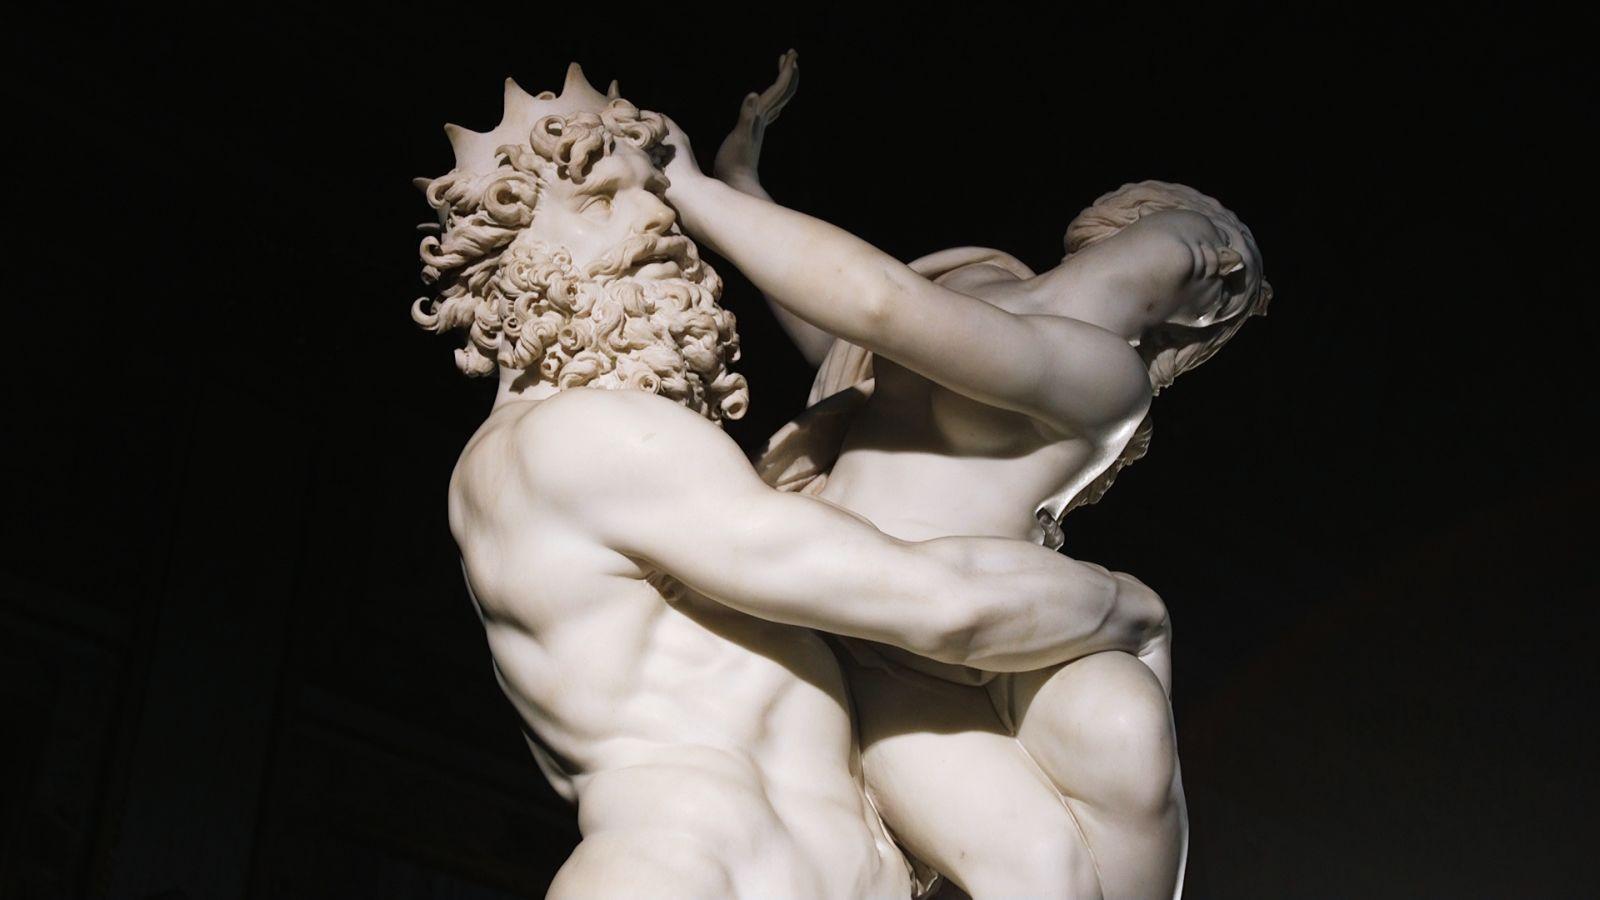 Musei - Galleria Borghese